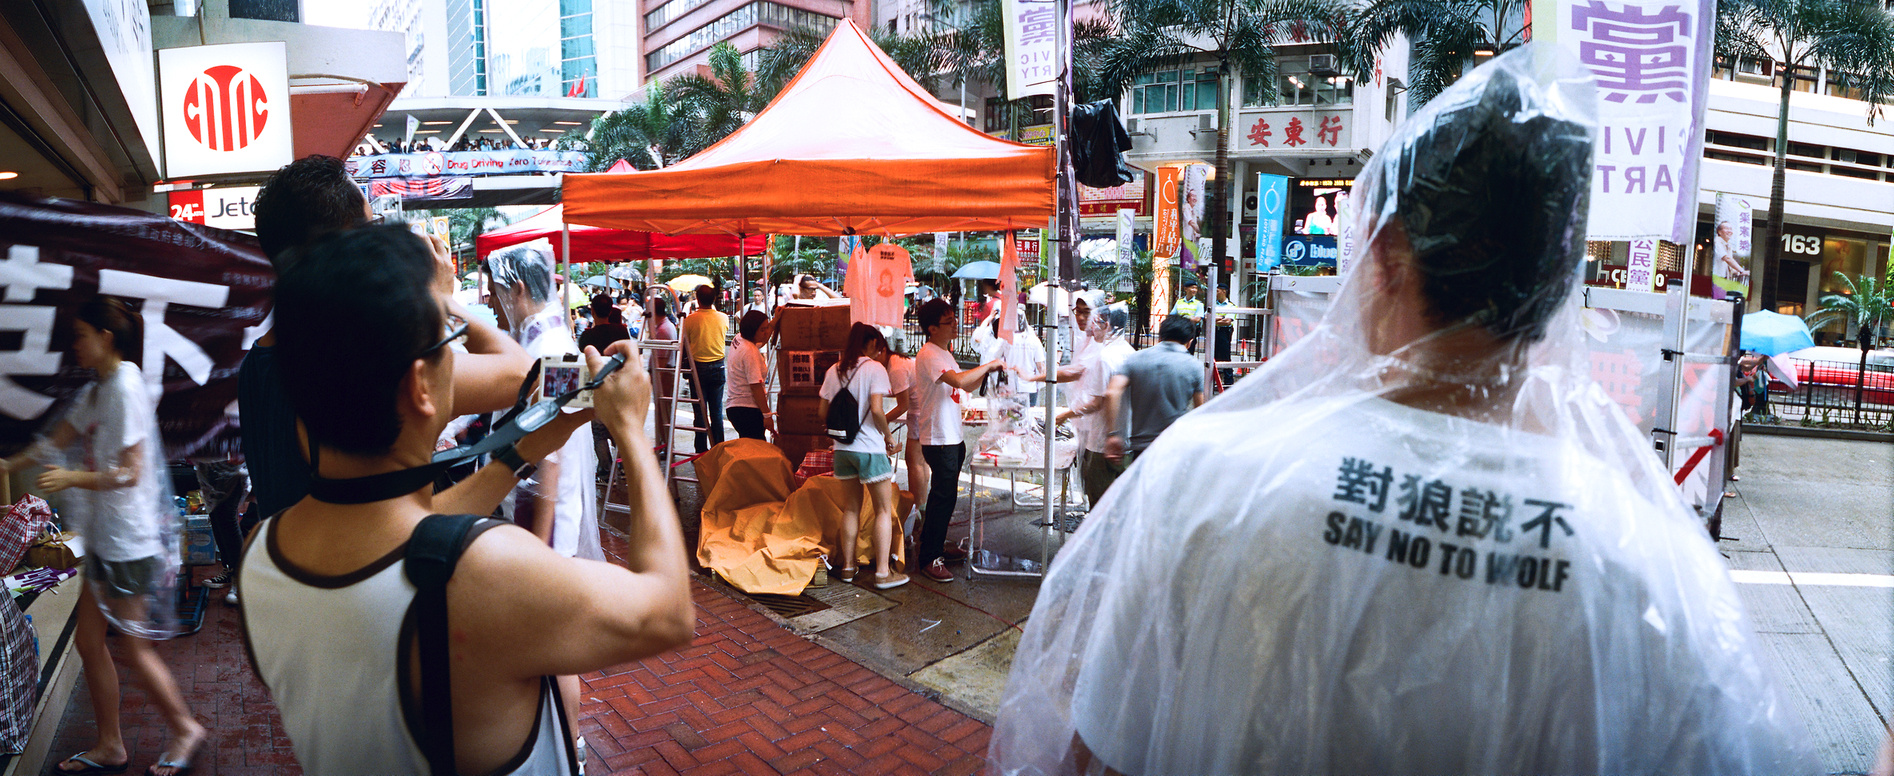 Say No to Wolf aka Resist CY Leung